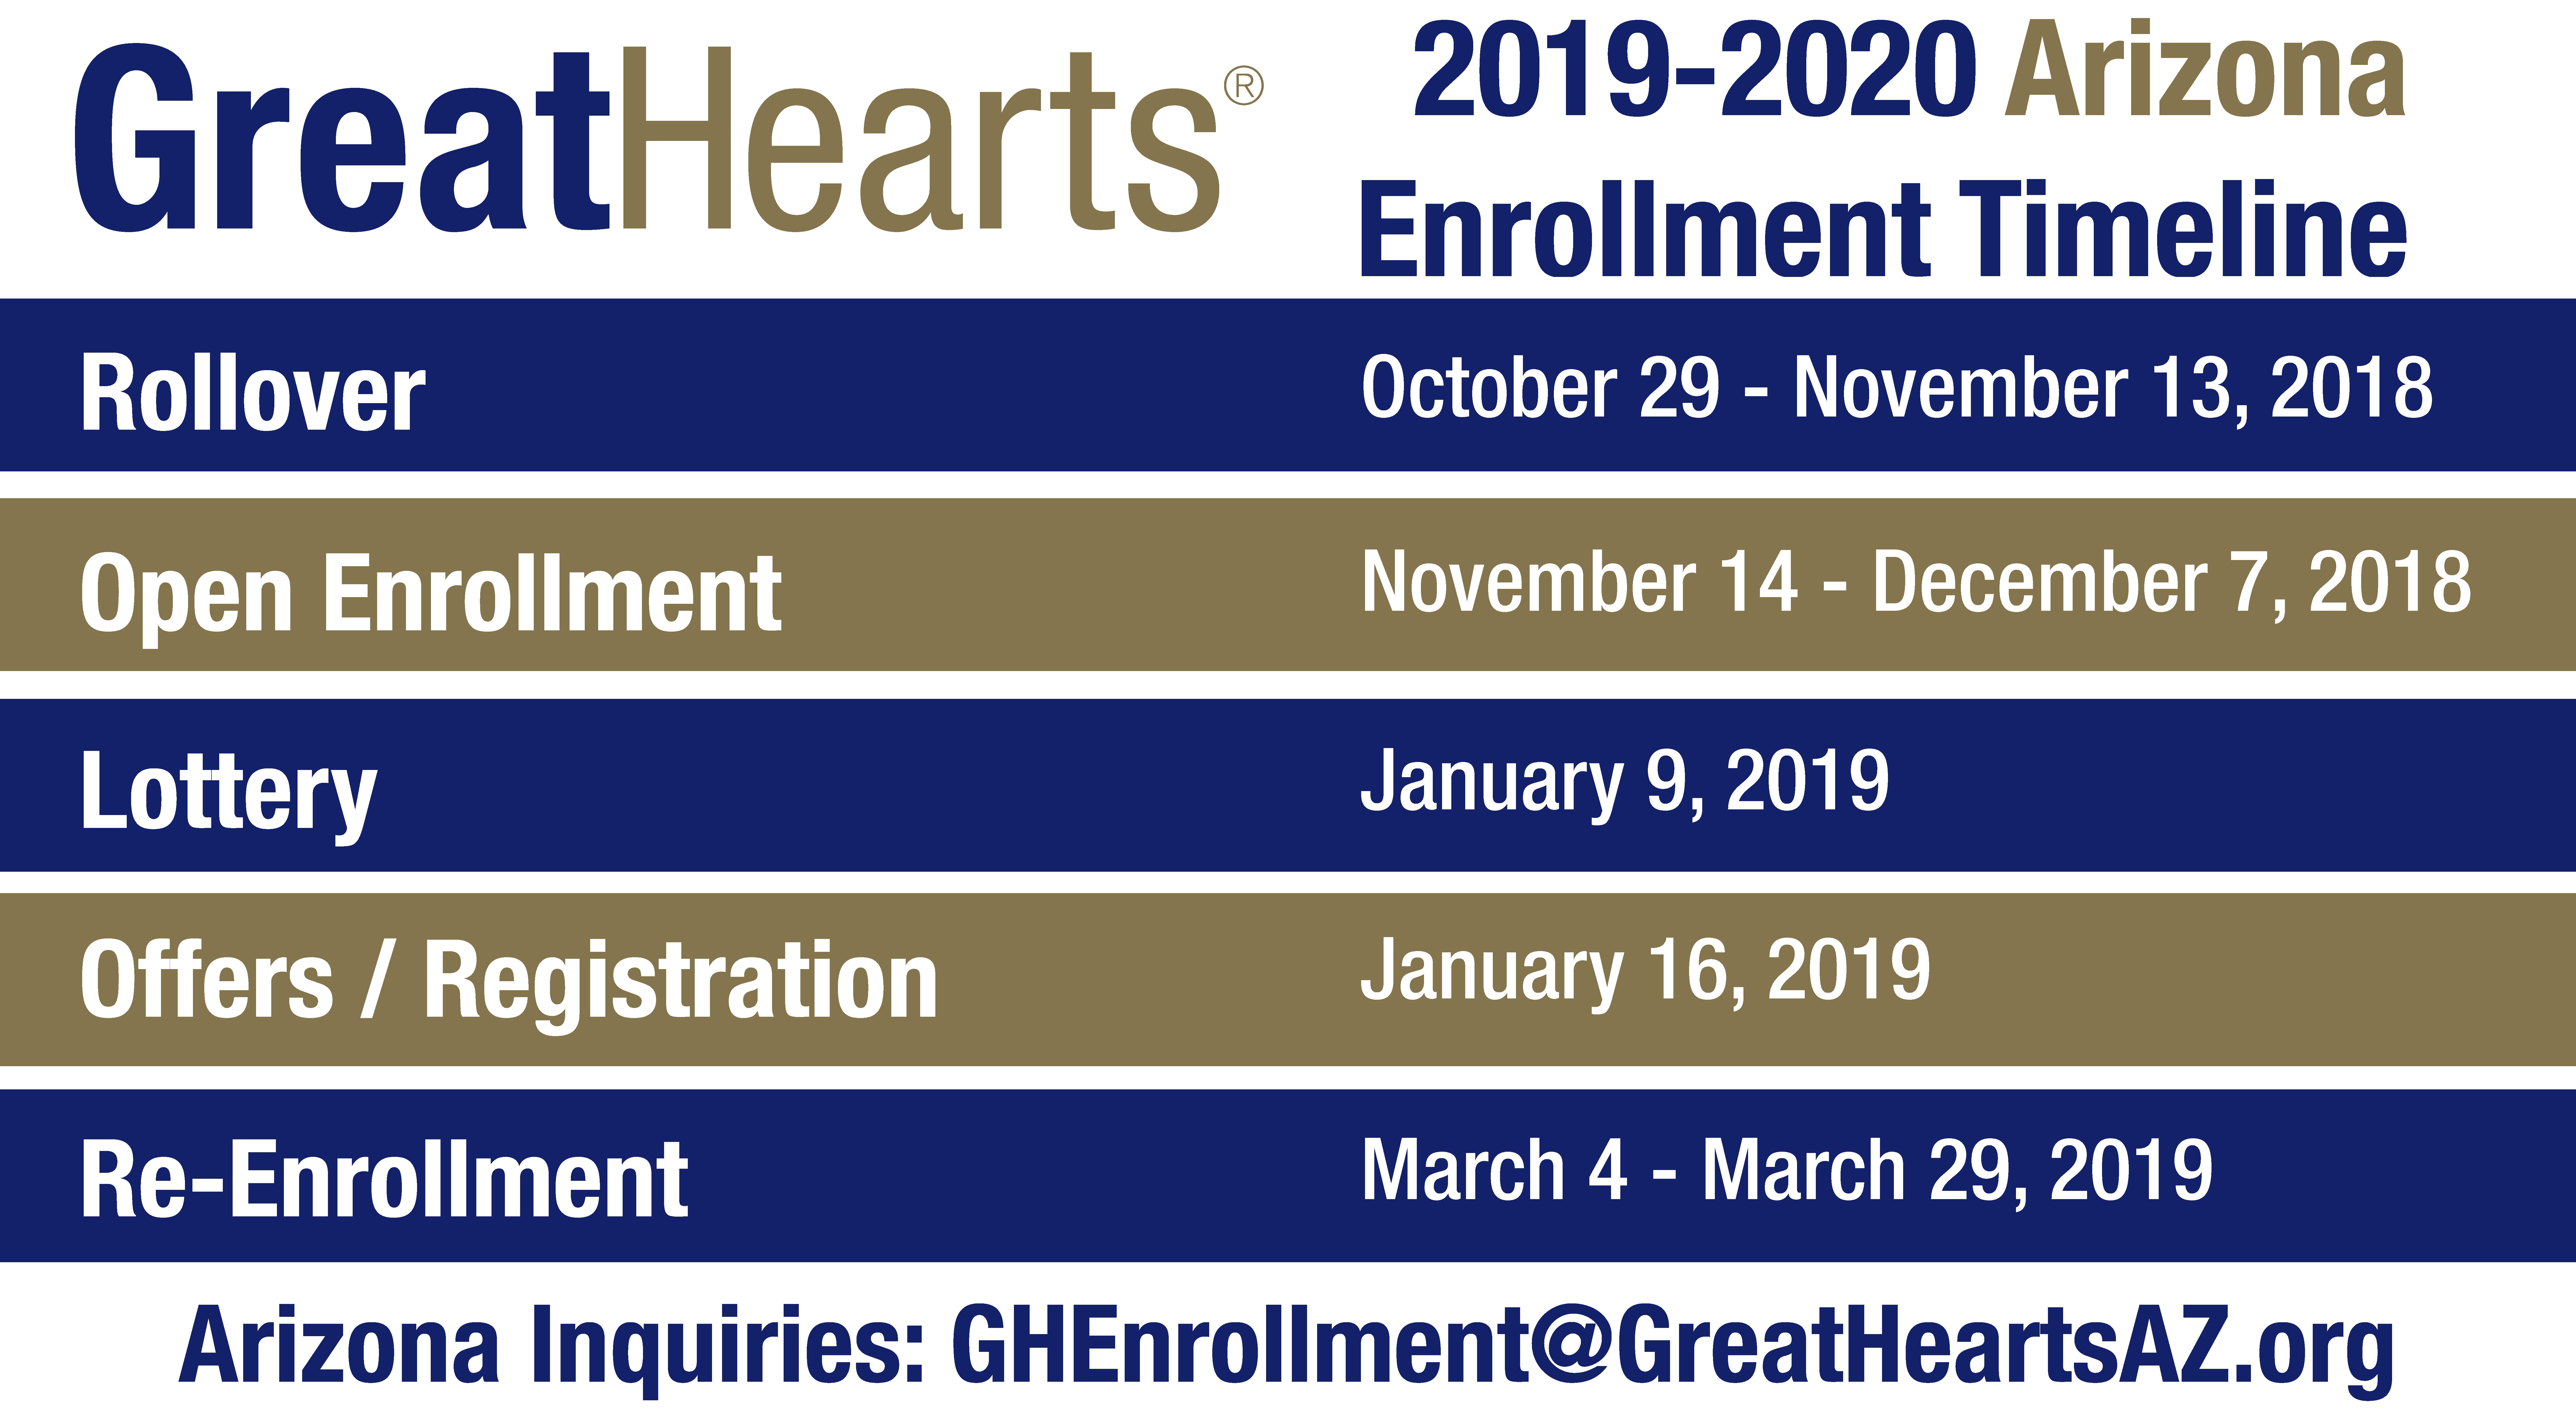 2019-2020 Enrollment Arizona timeline